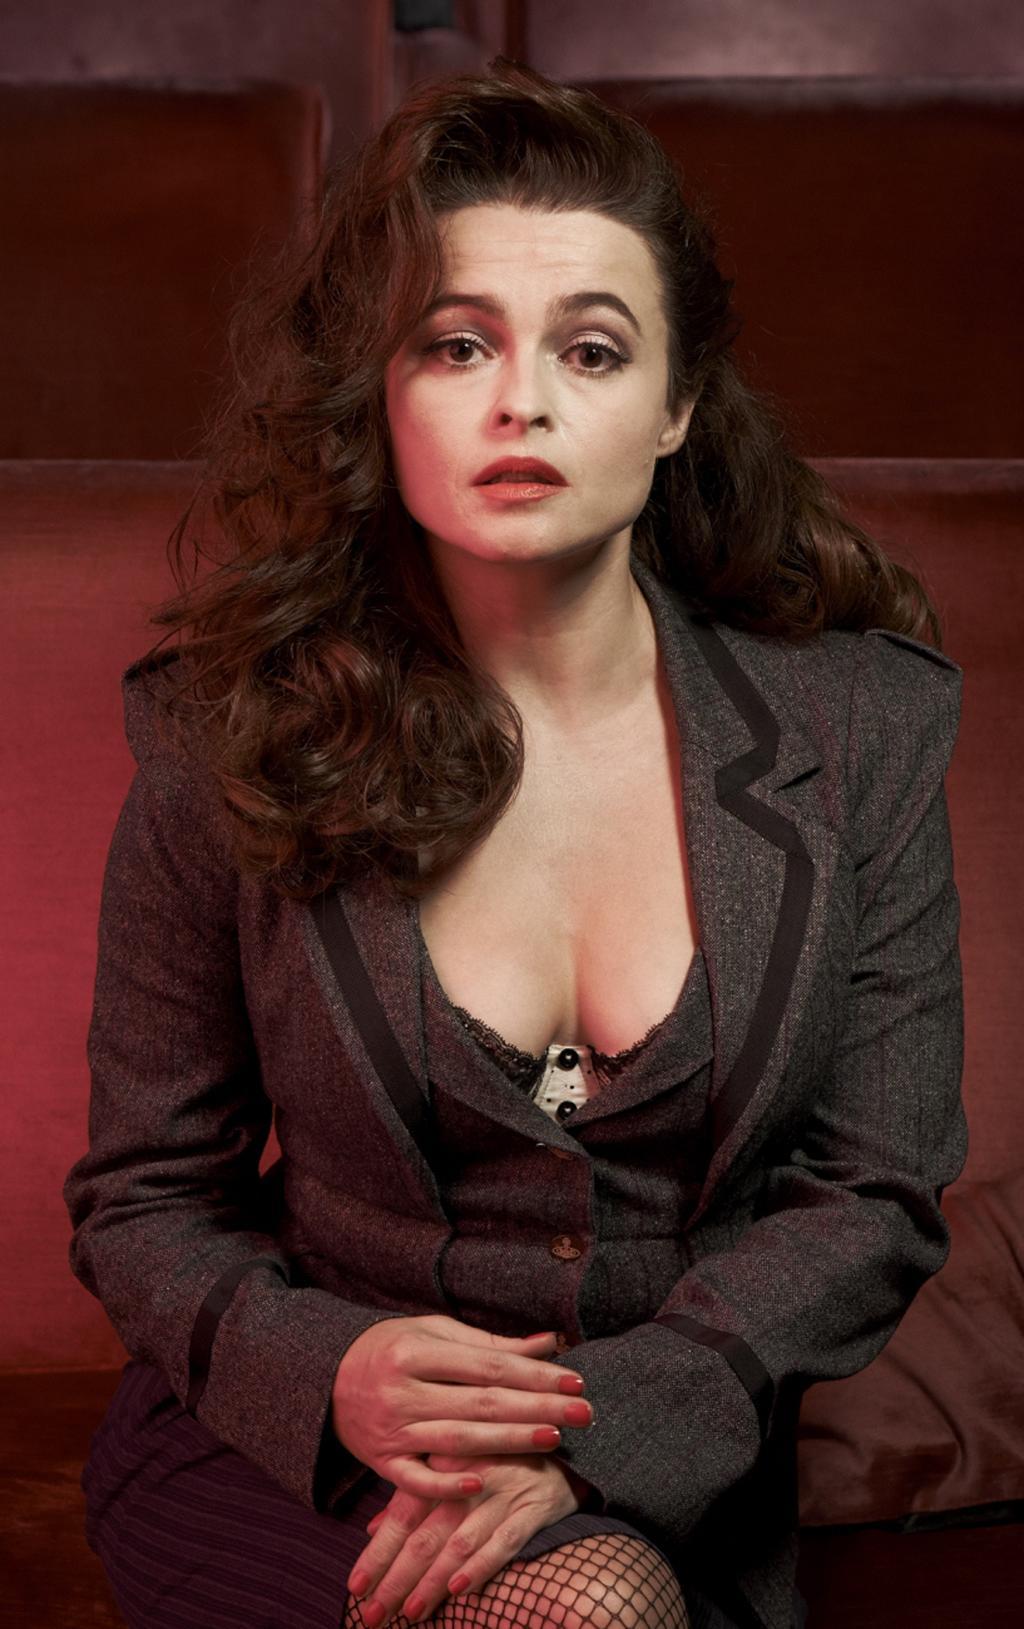 Helena Bonham Carter Interview     TS Spivet     Time Out Film